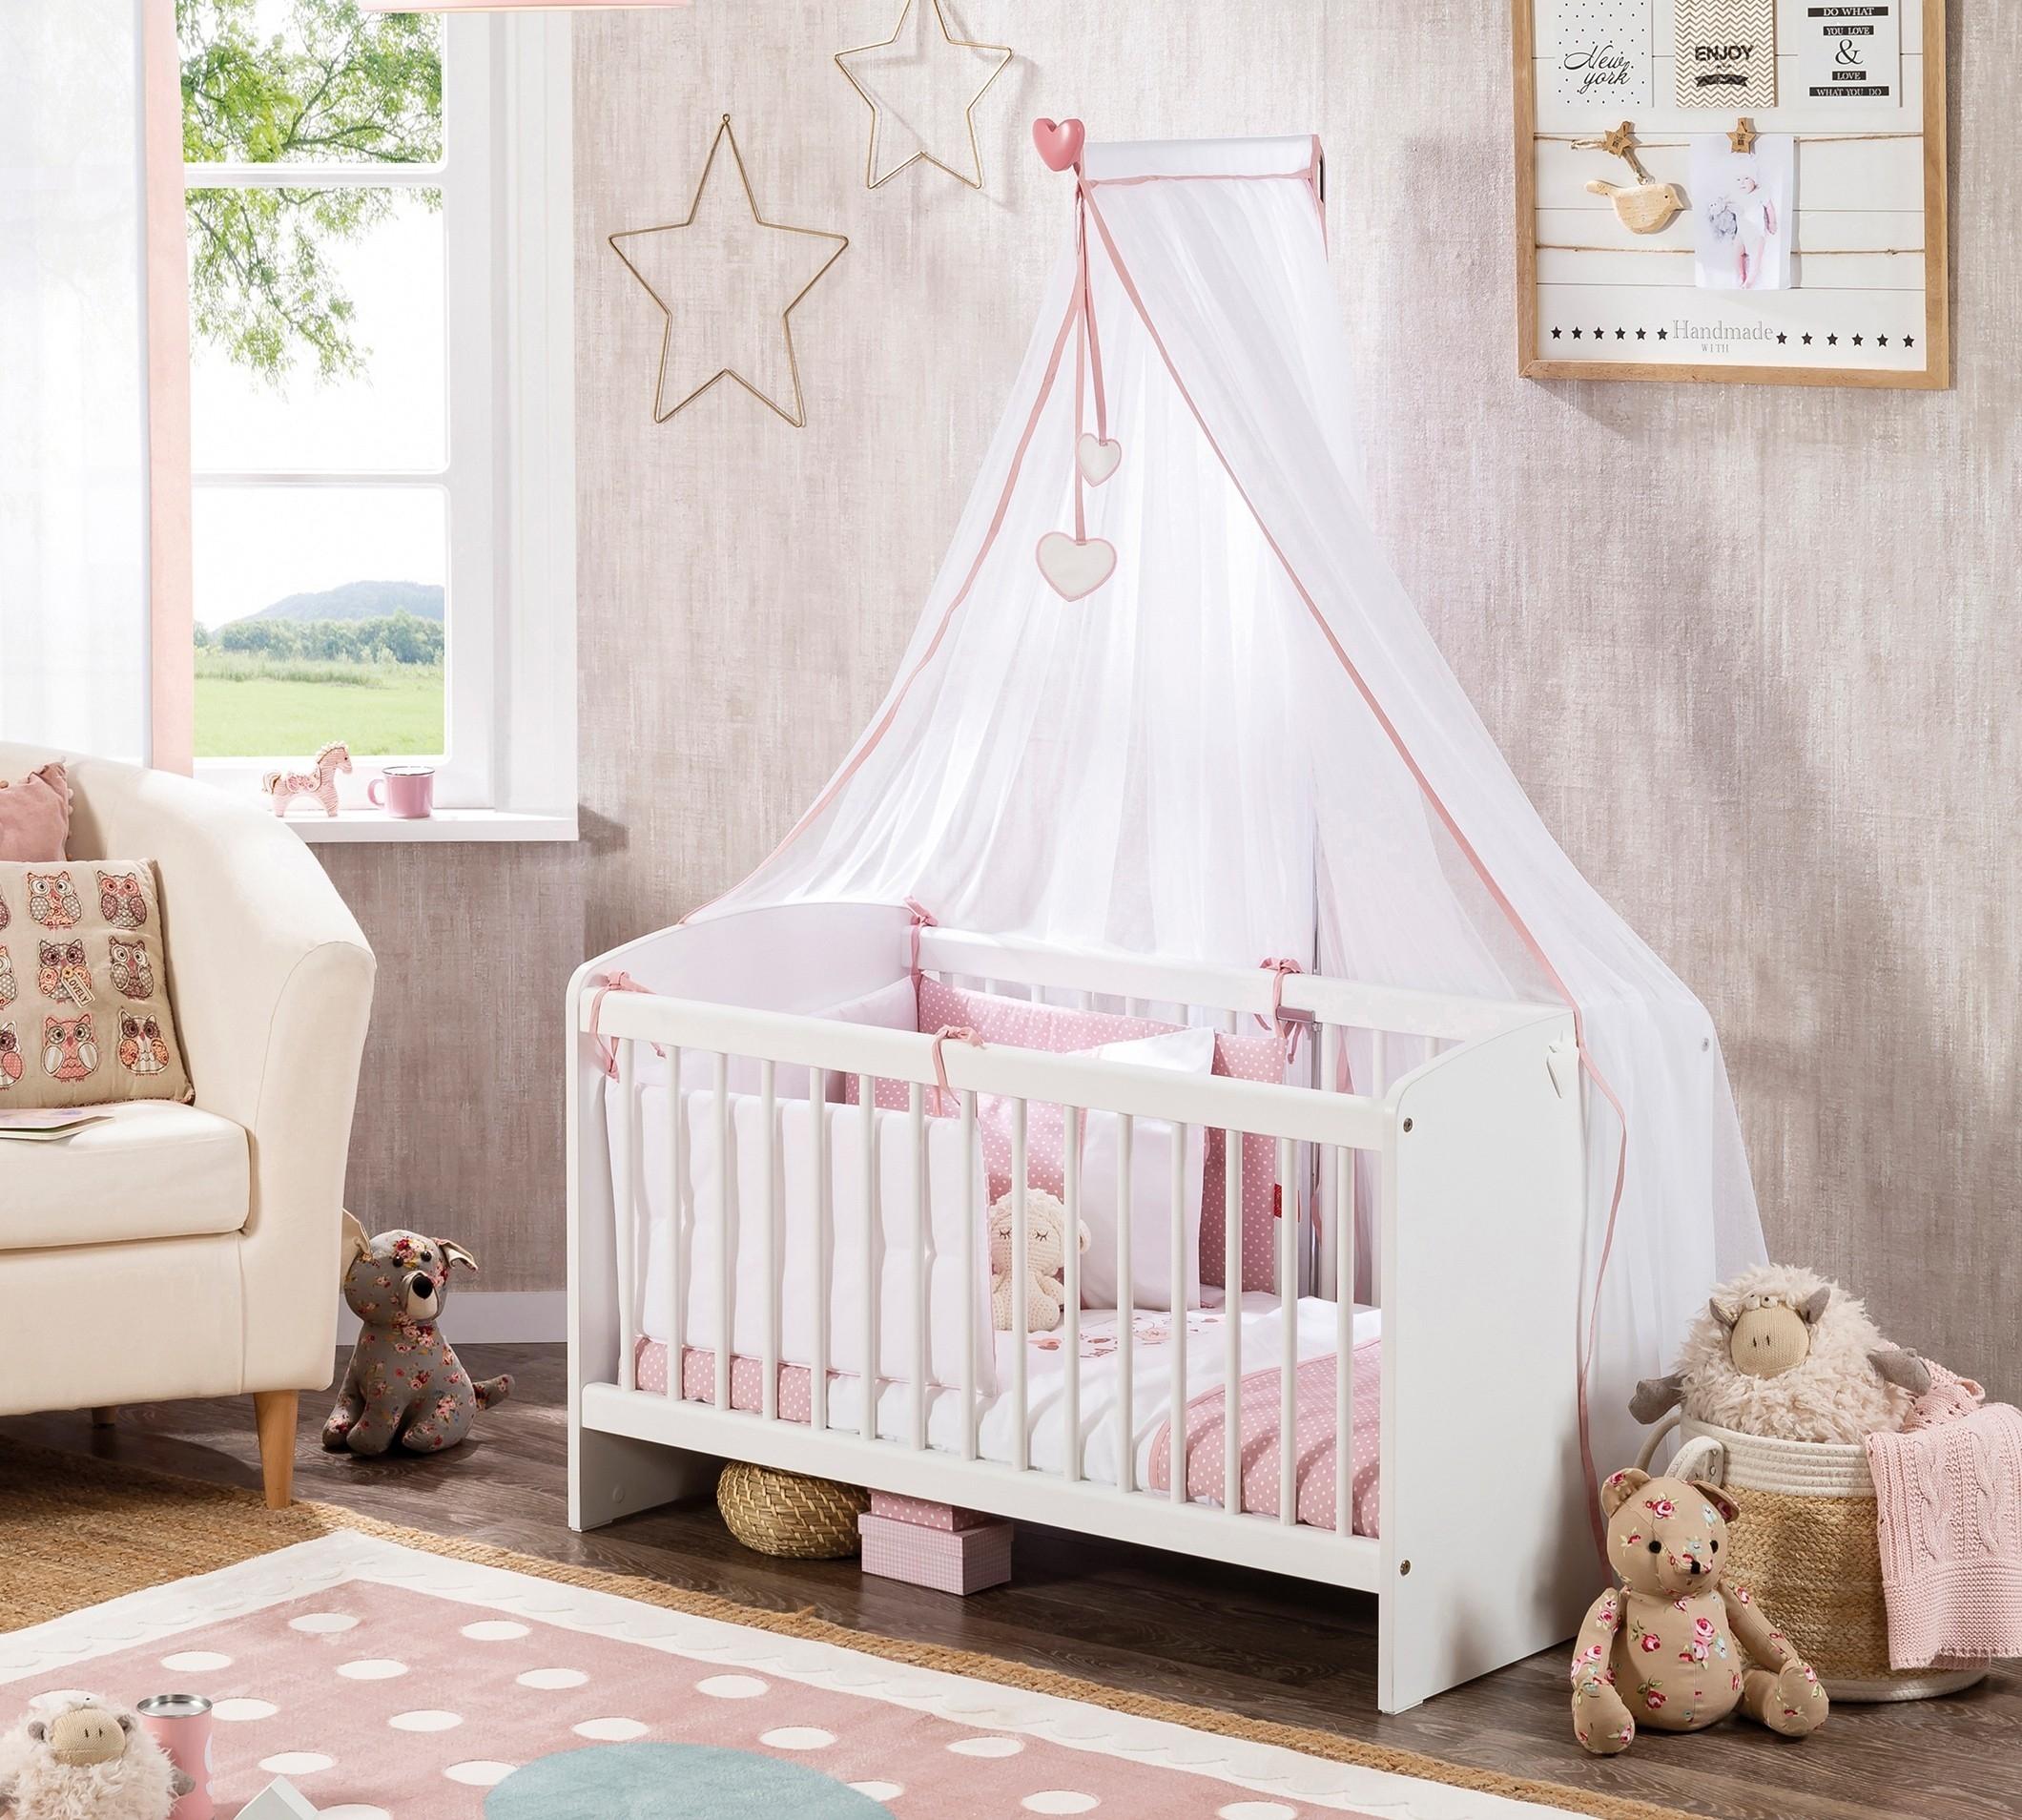 Patut din pal, pentru bebe Cradle Baby Alb, 100 x 50 cm poza